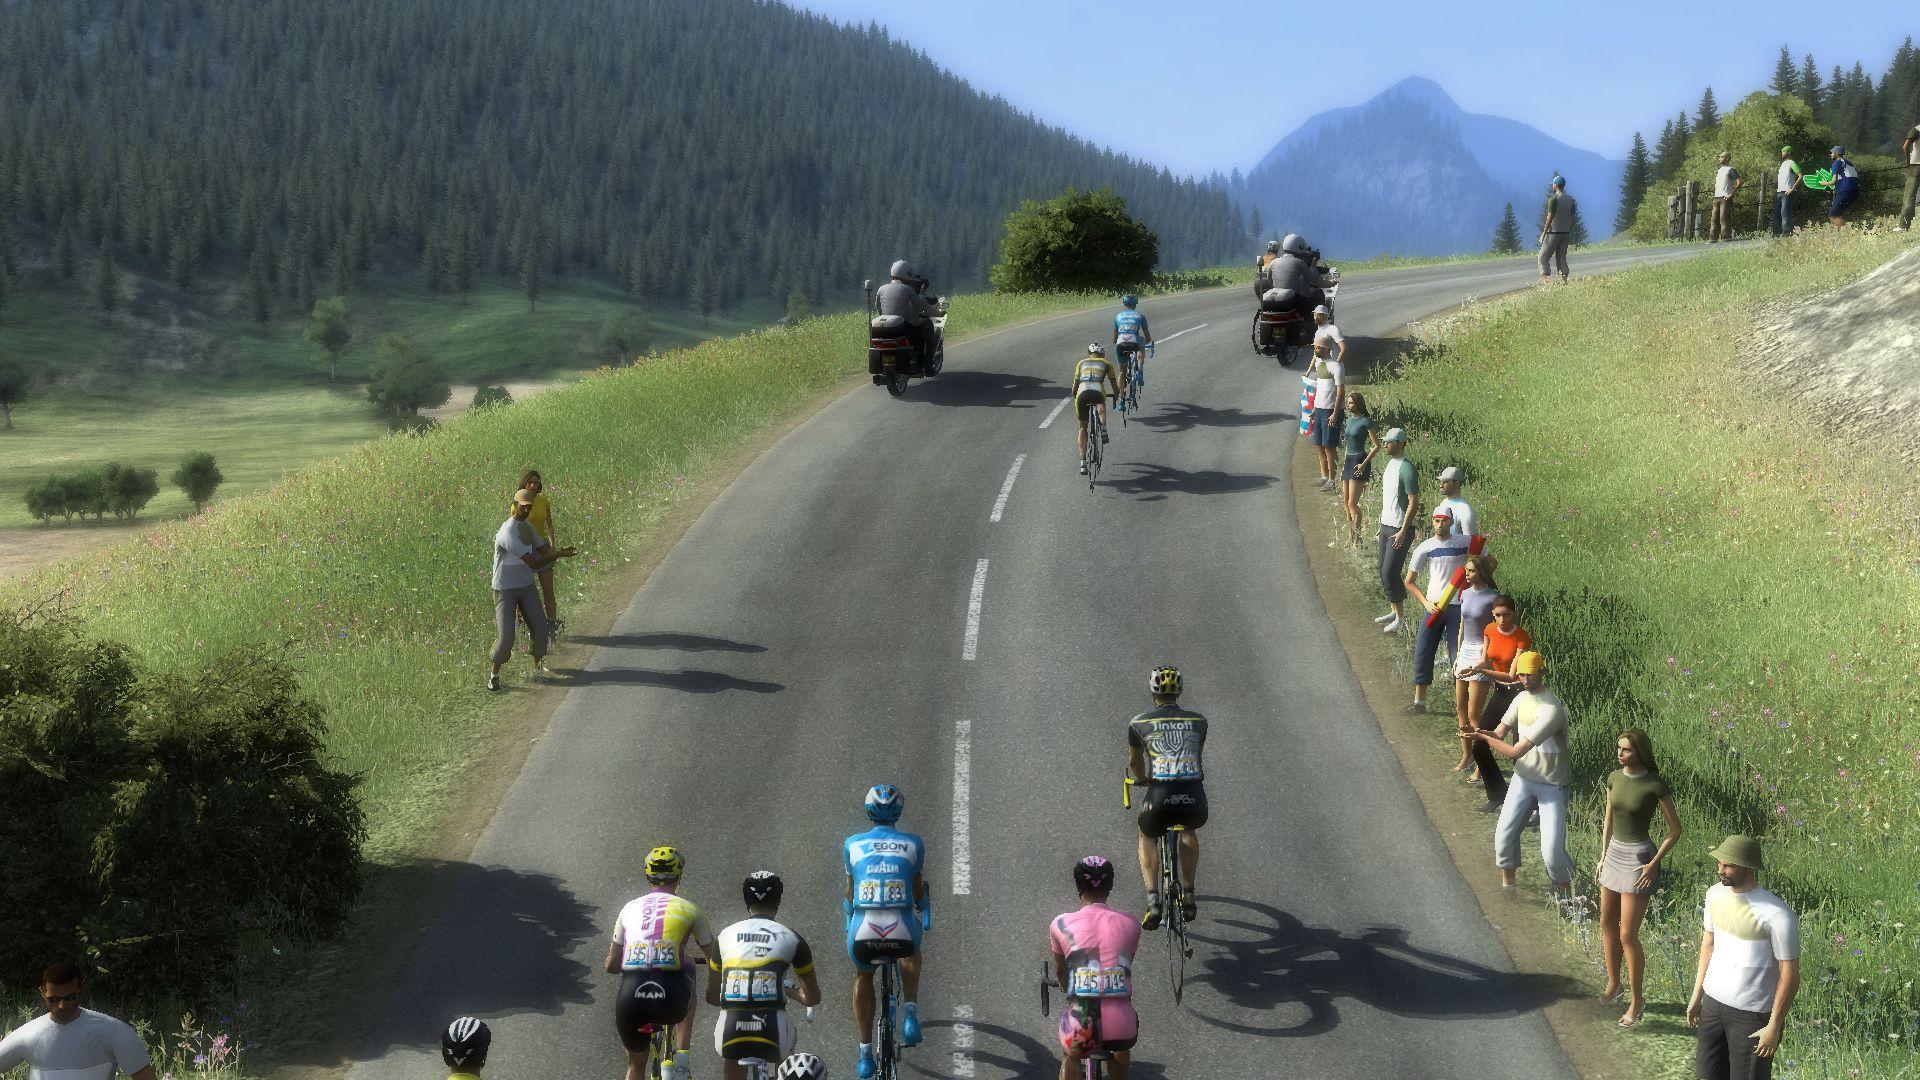 pcmdaily.com/images/mg/2017/Races/U23/Avenir/AVES7%2018.jpg